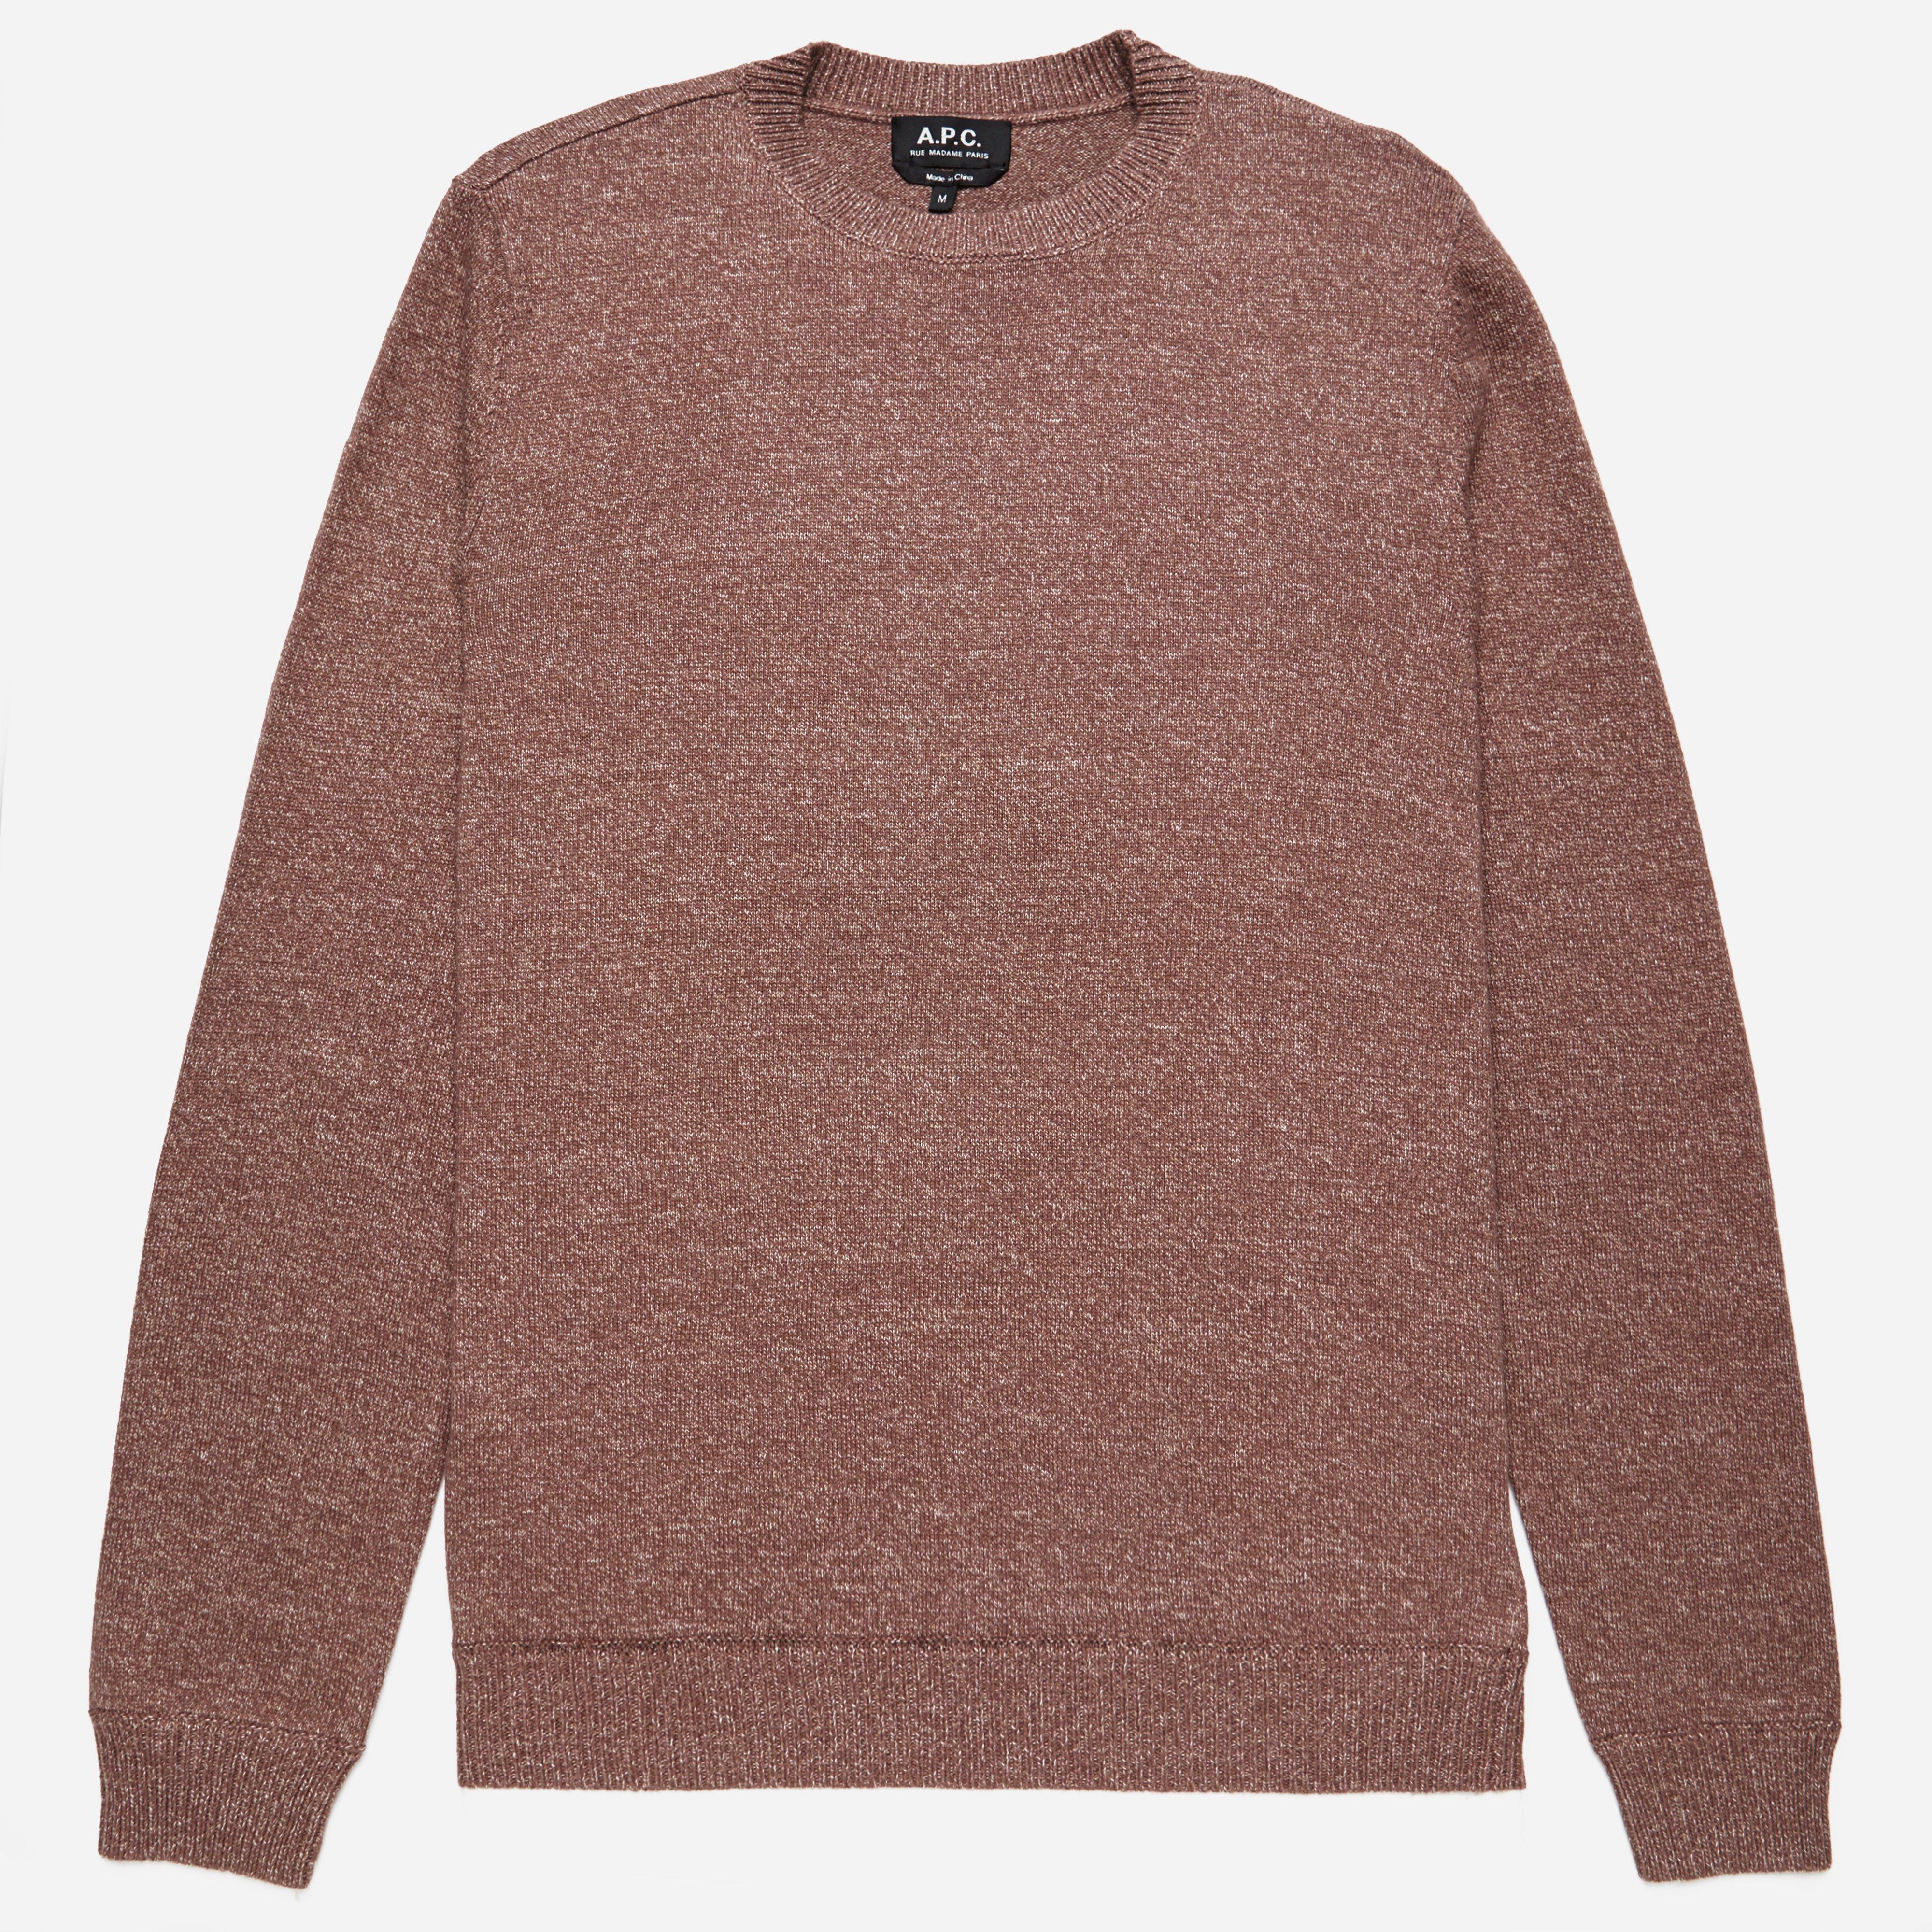 A.P.C Pull Lito Sweatshirt